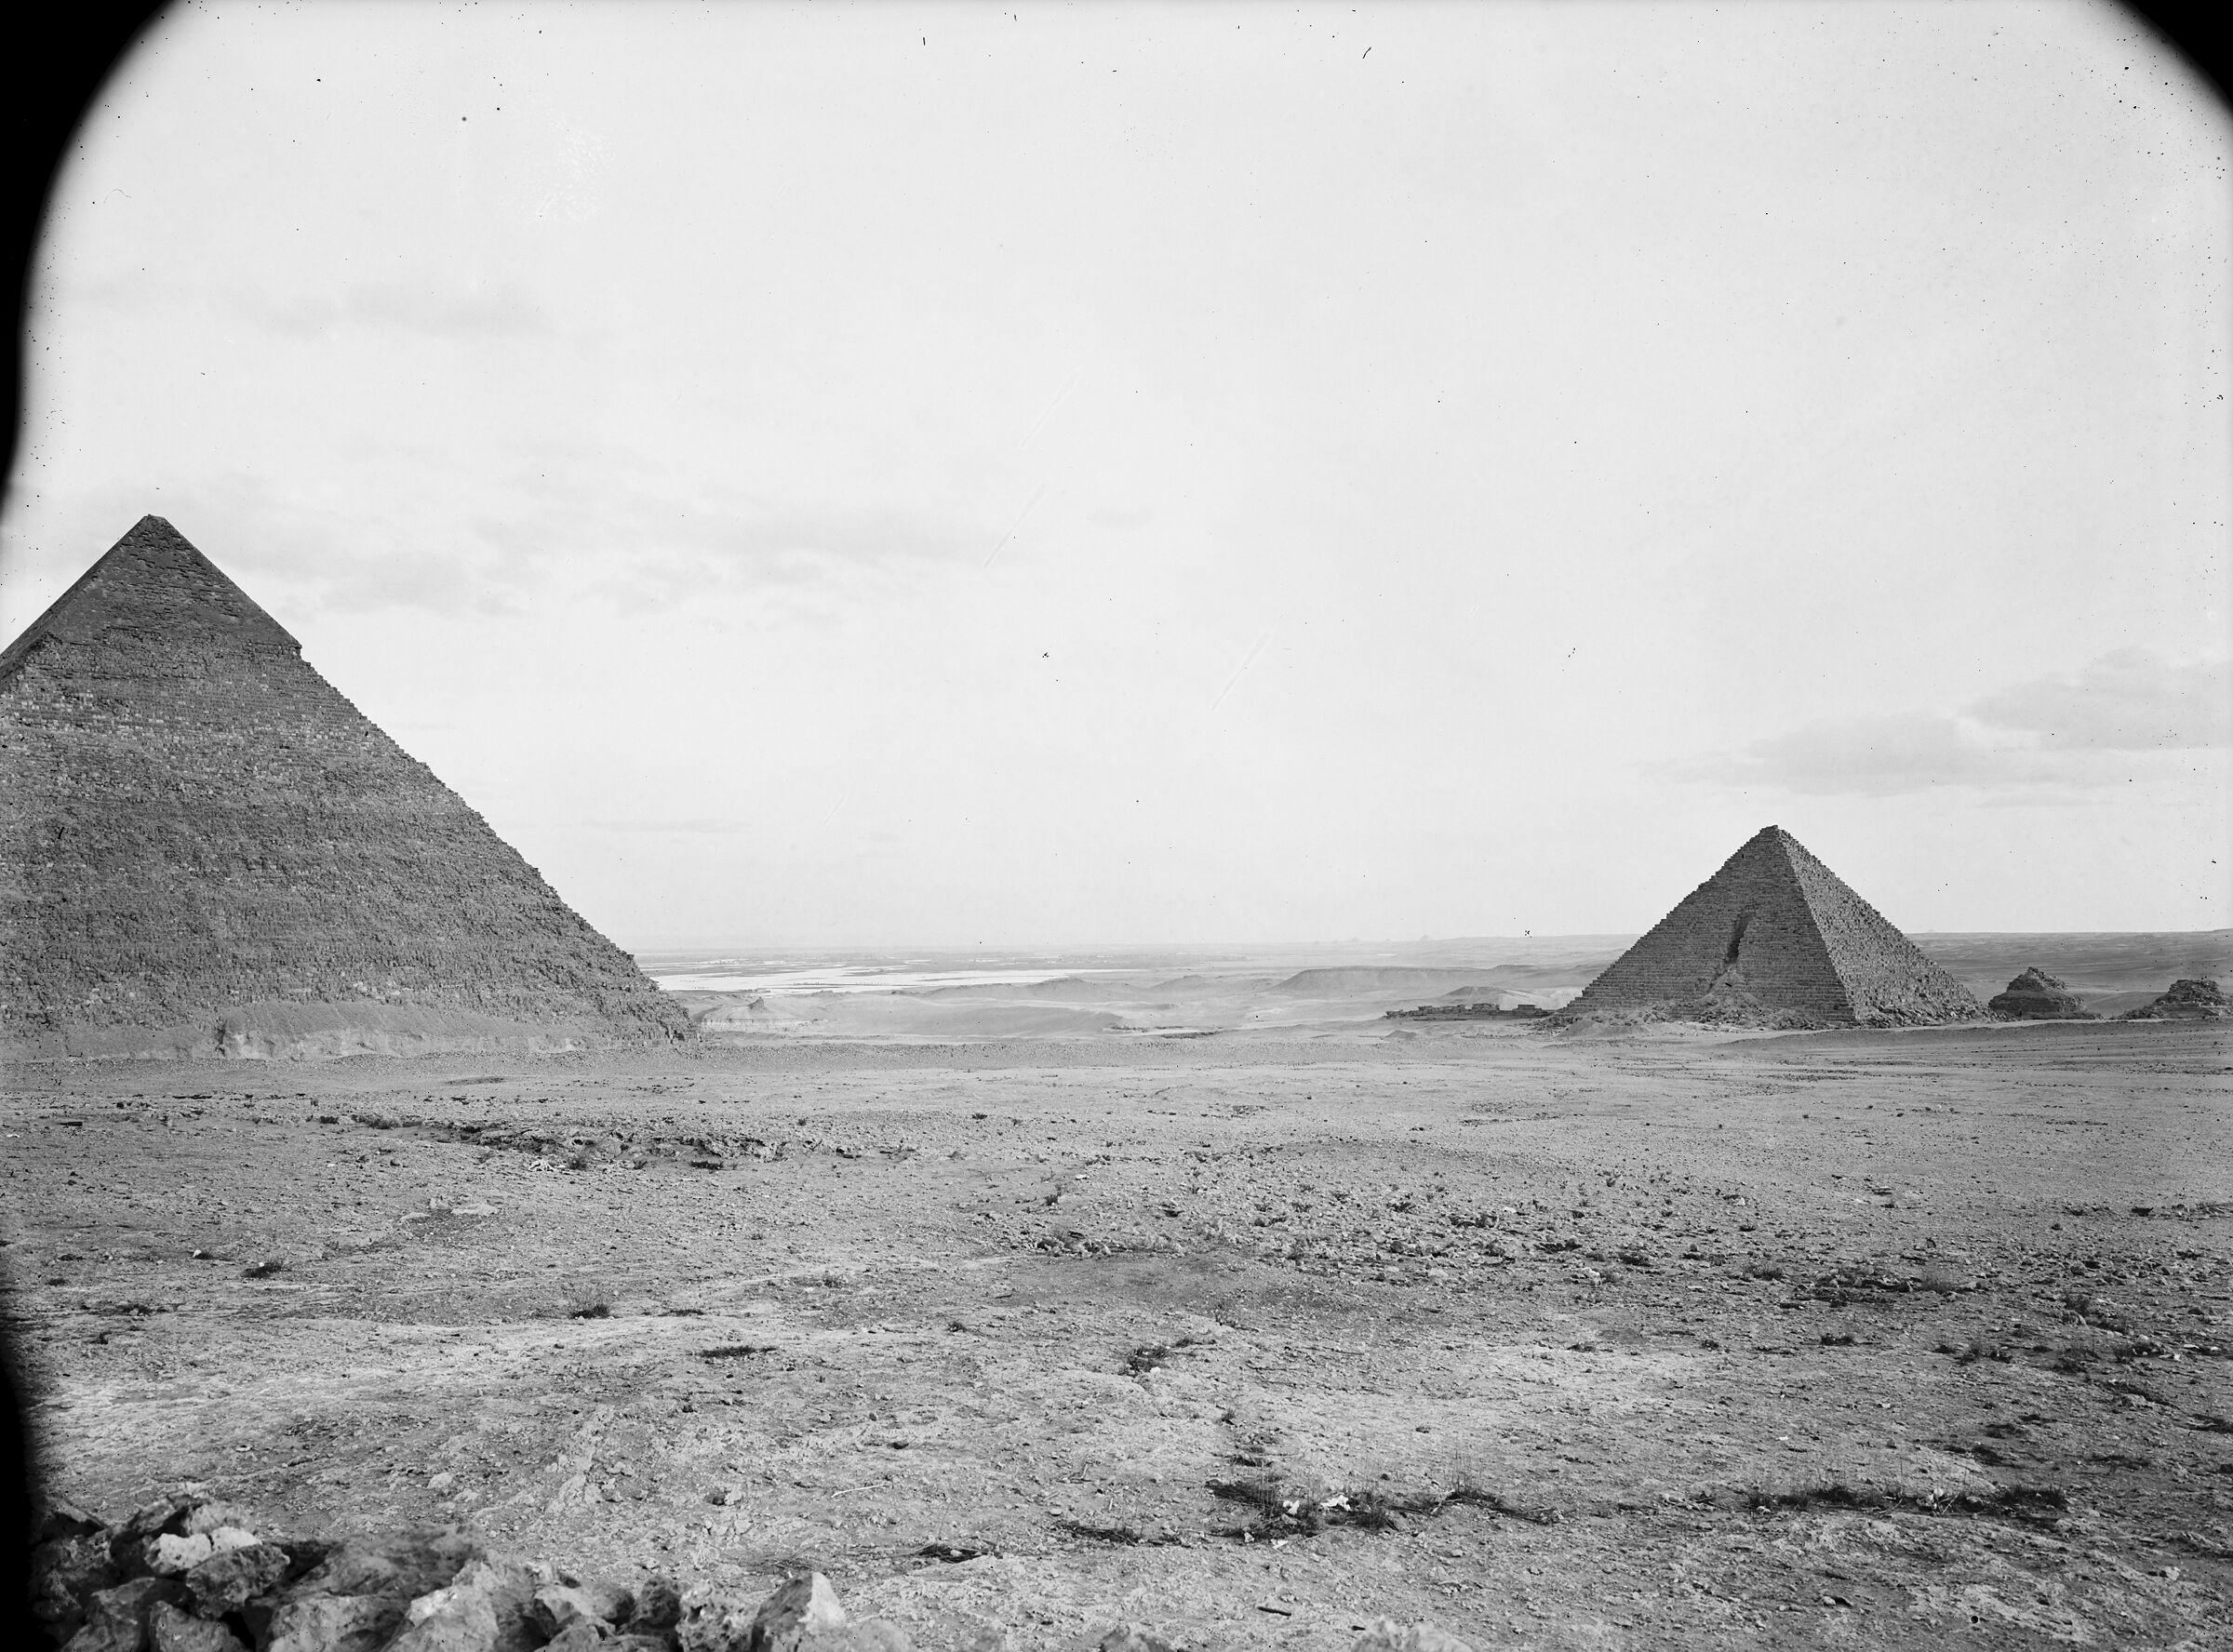 Menkaure Pyramid Complex: Site: Giza; View: Khafre pyramid, Menkaure pyramid